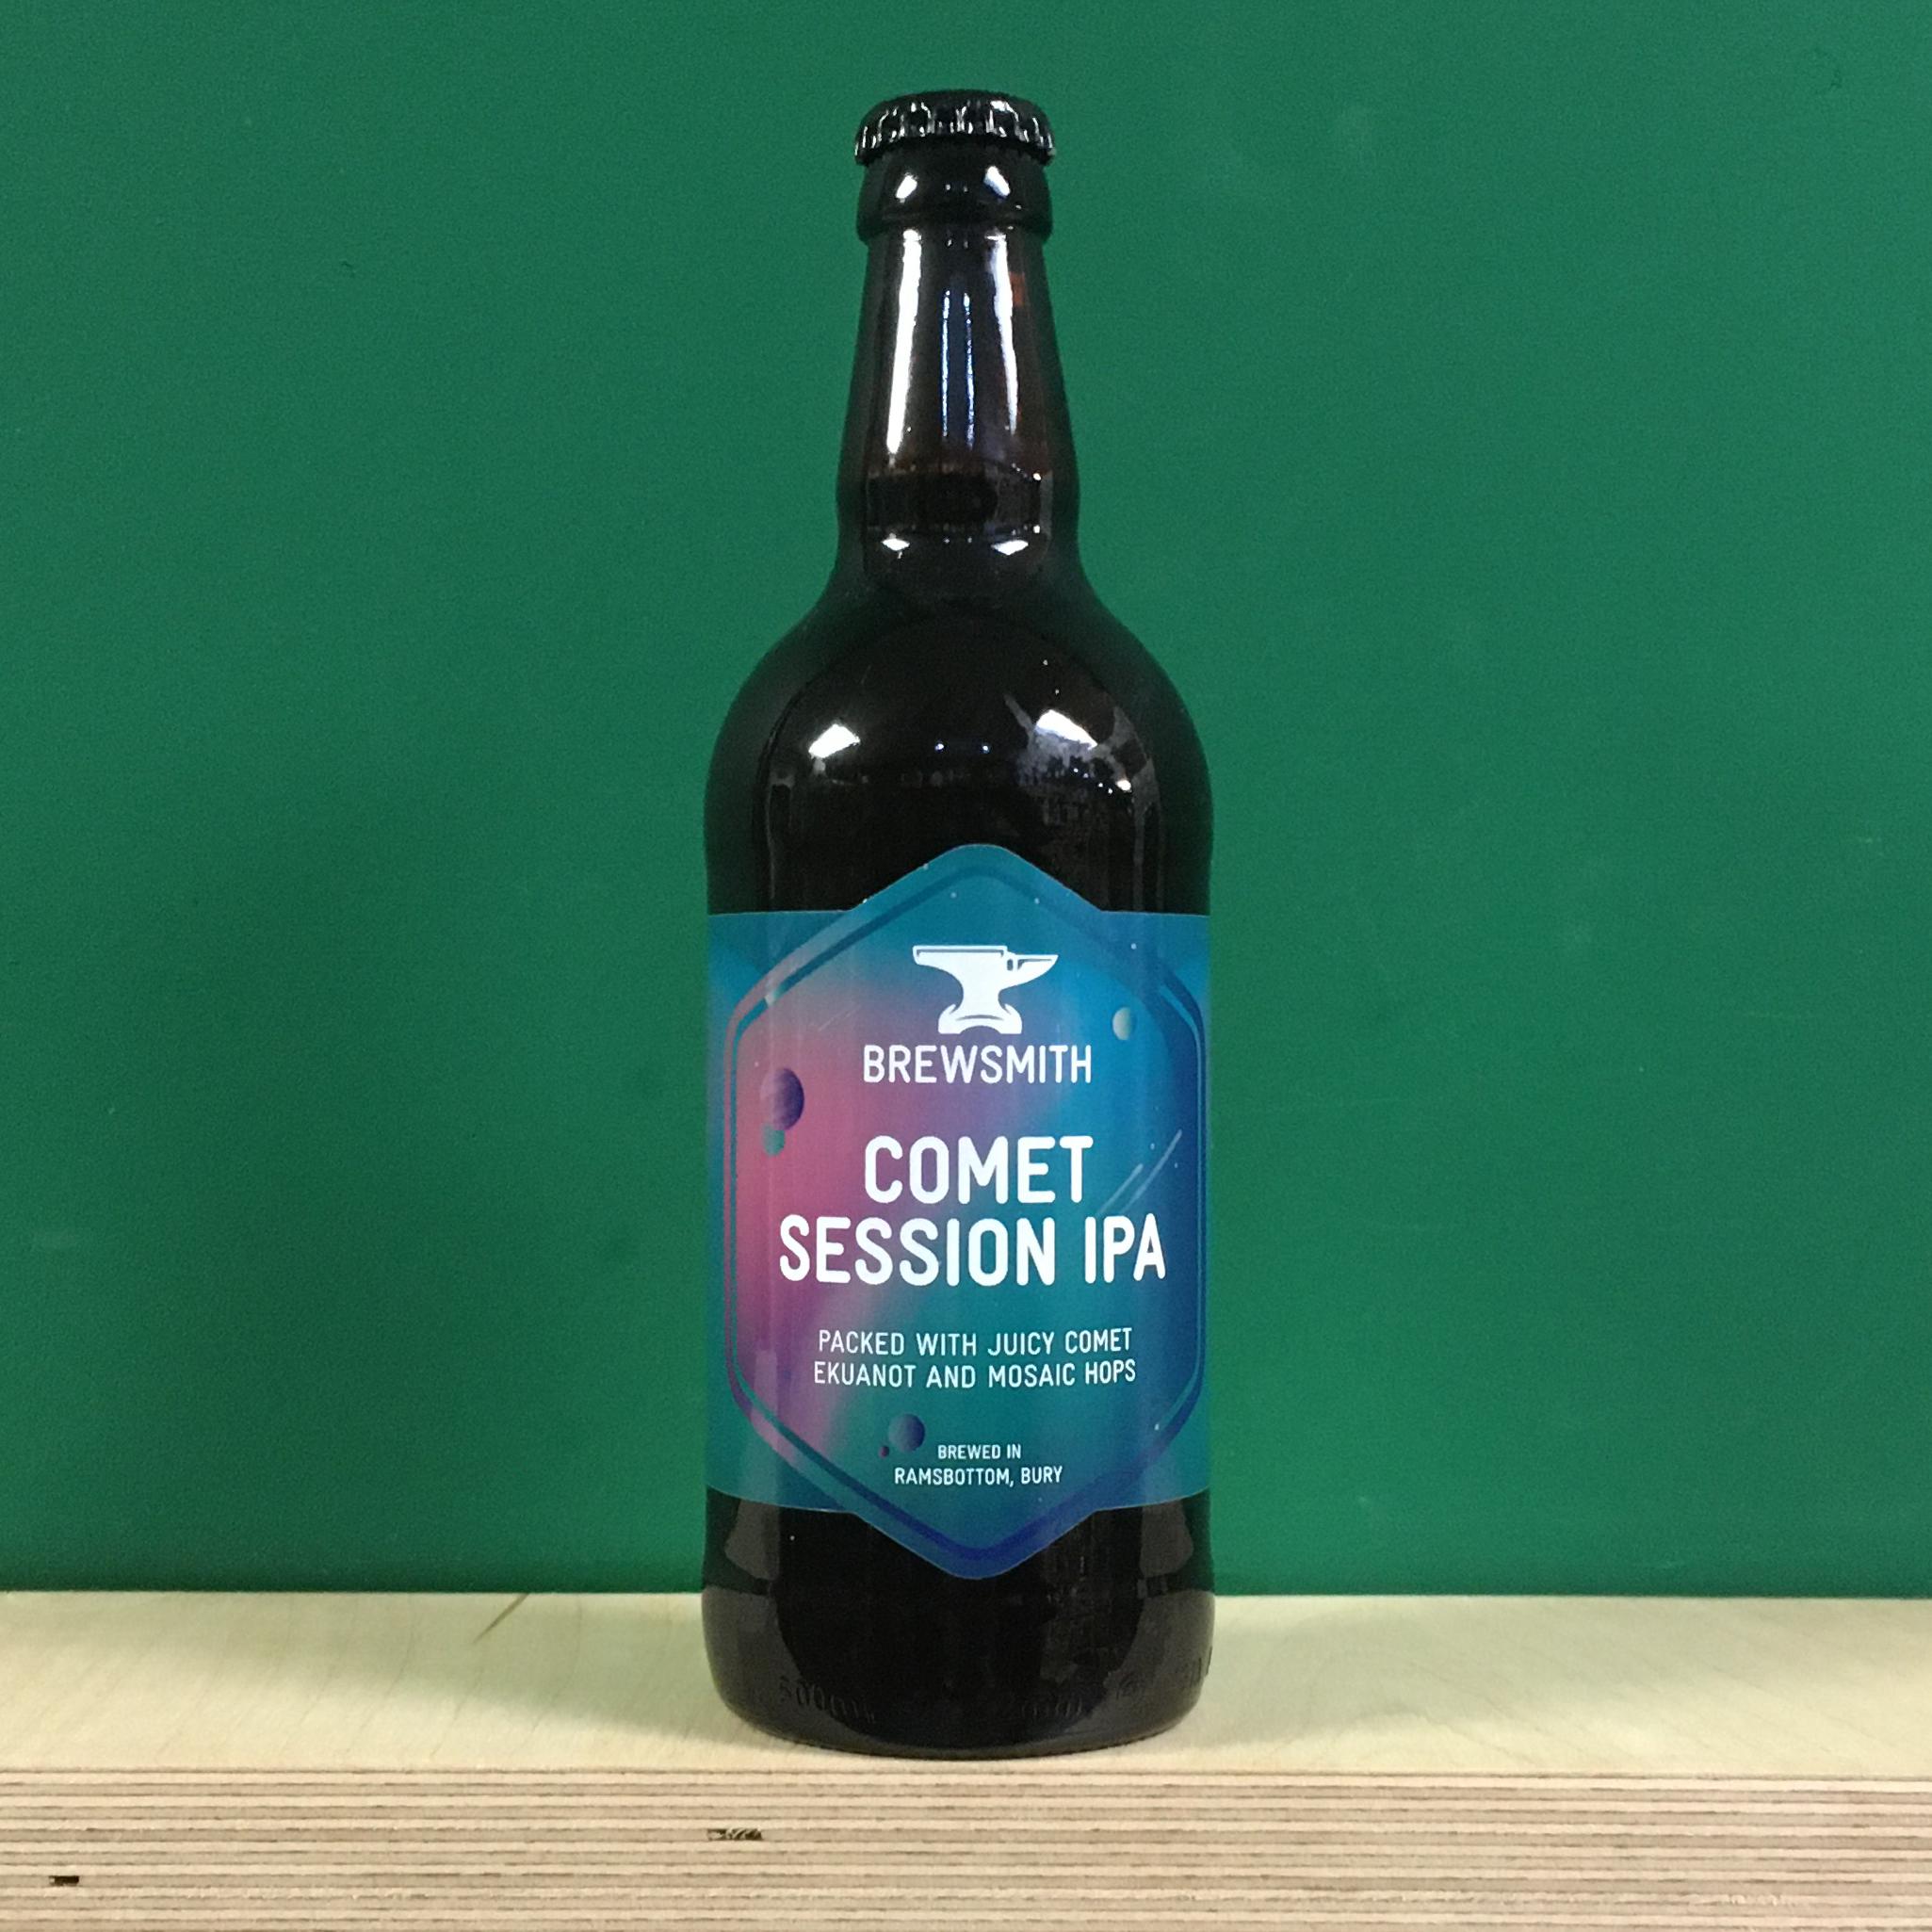 Brewsmith Comet